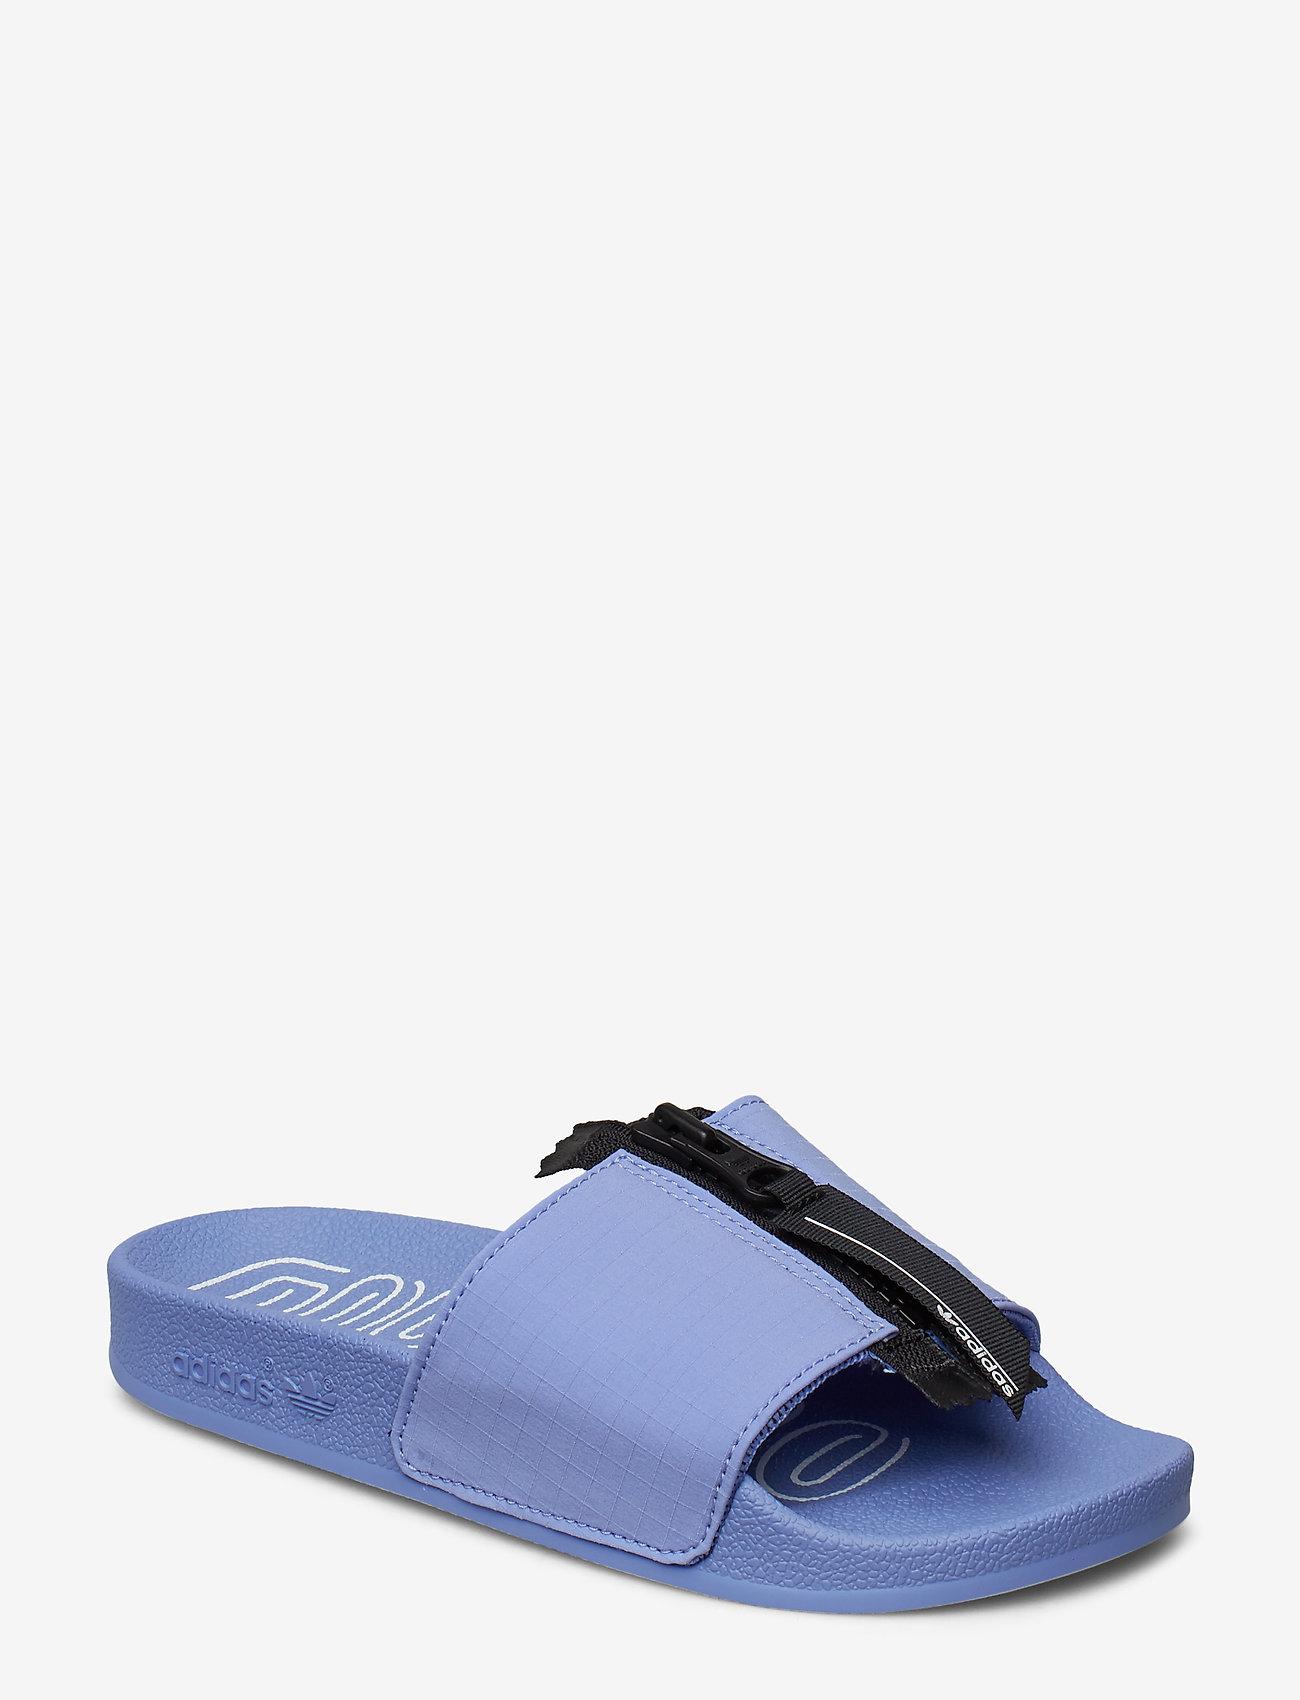 adidas Originals - ADILETTE ZIP W - sneakers - chapur/cblack/ftwwht - 0